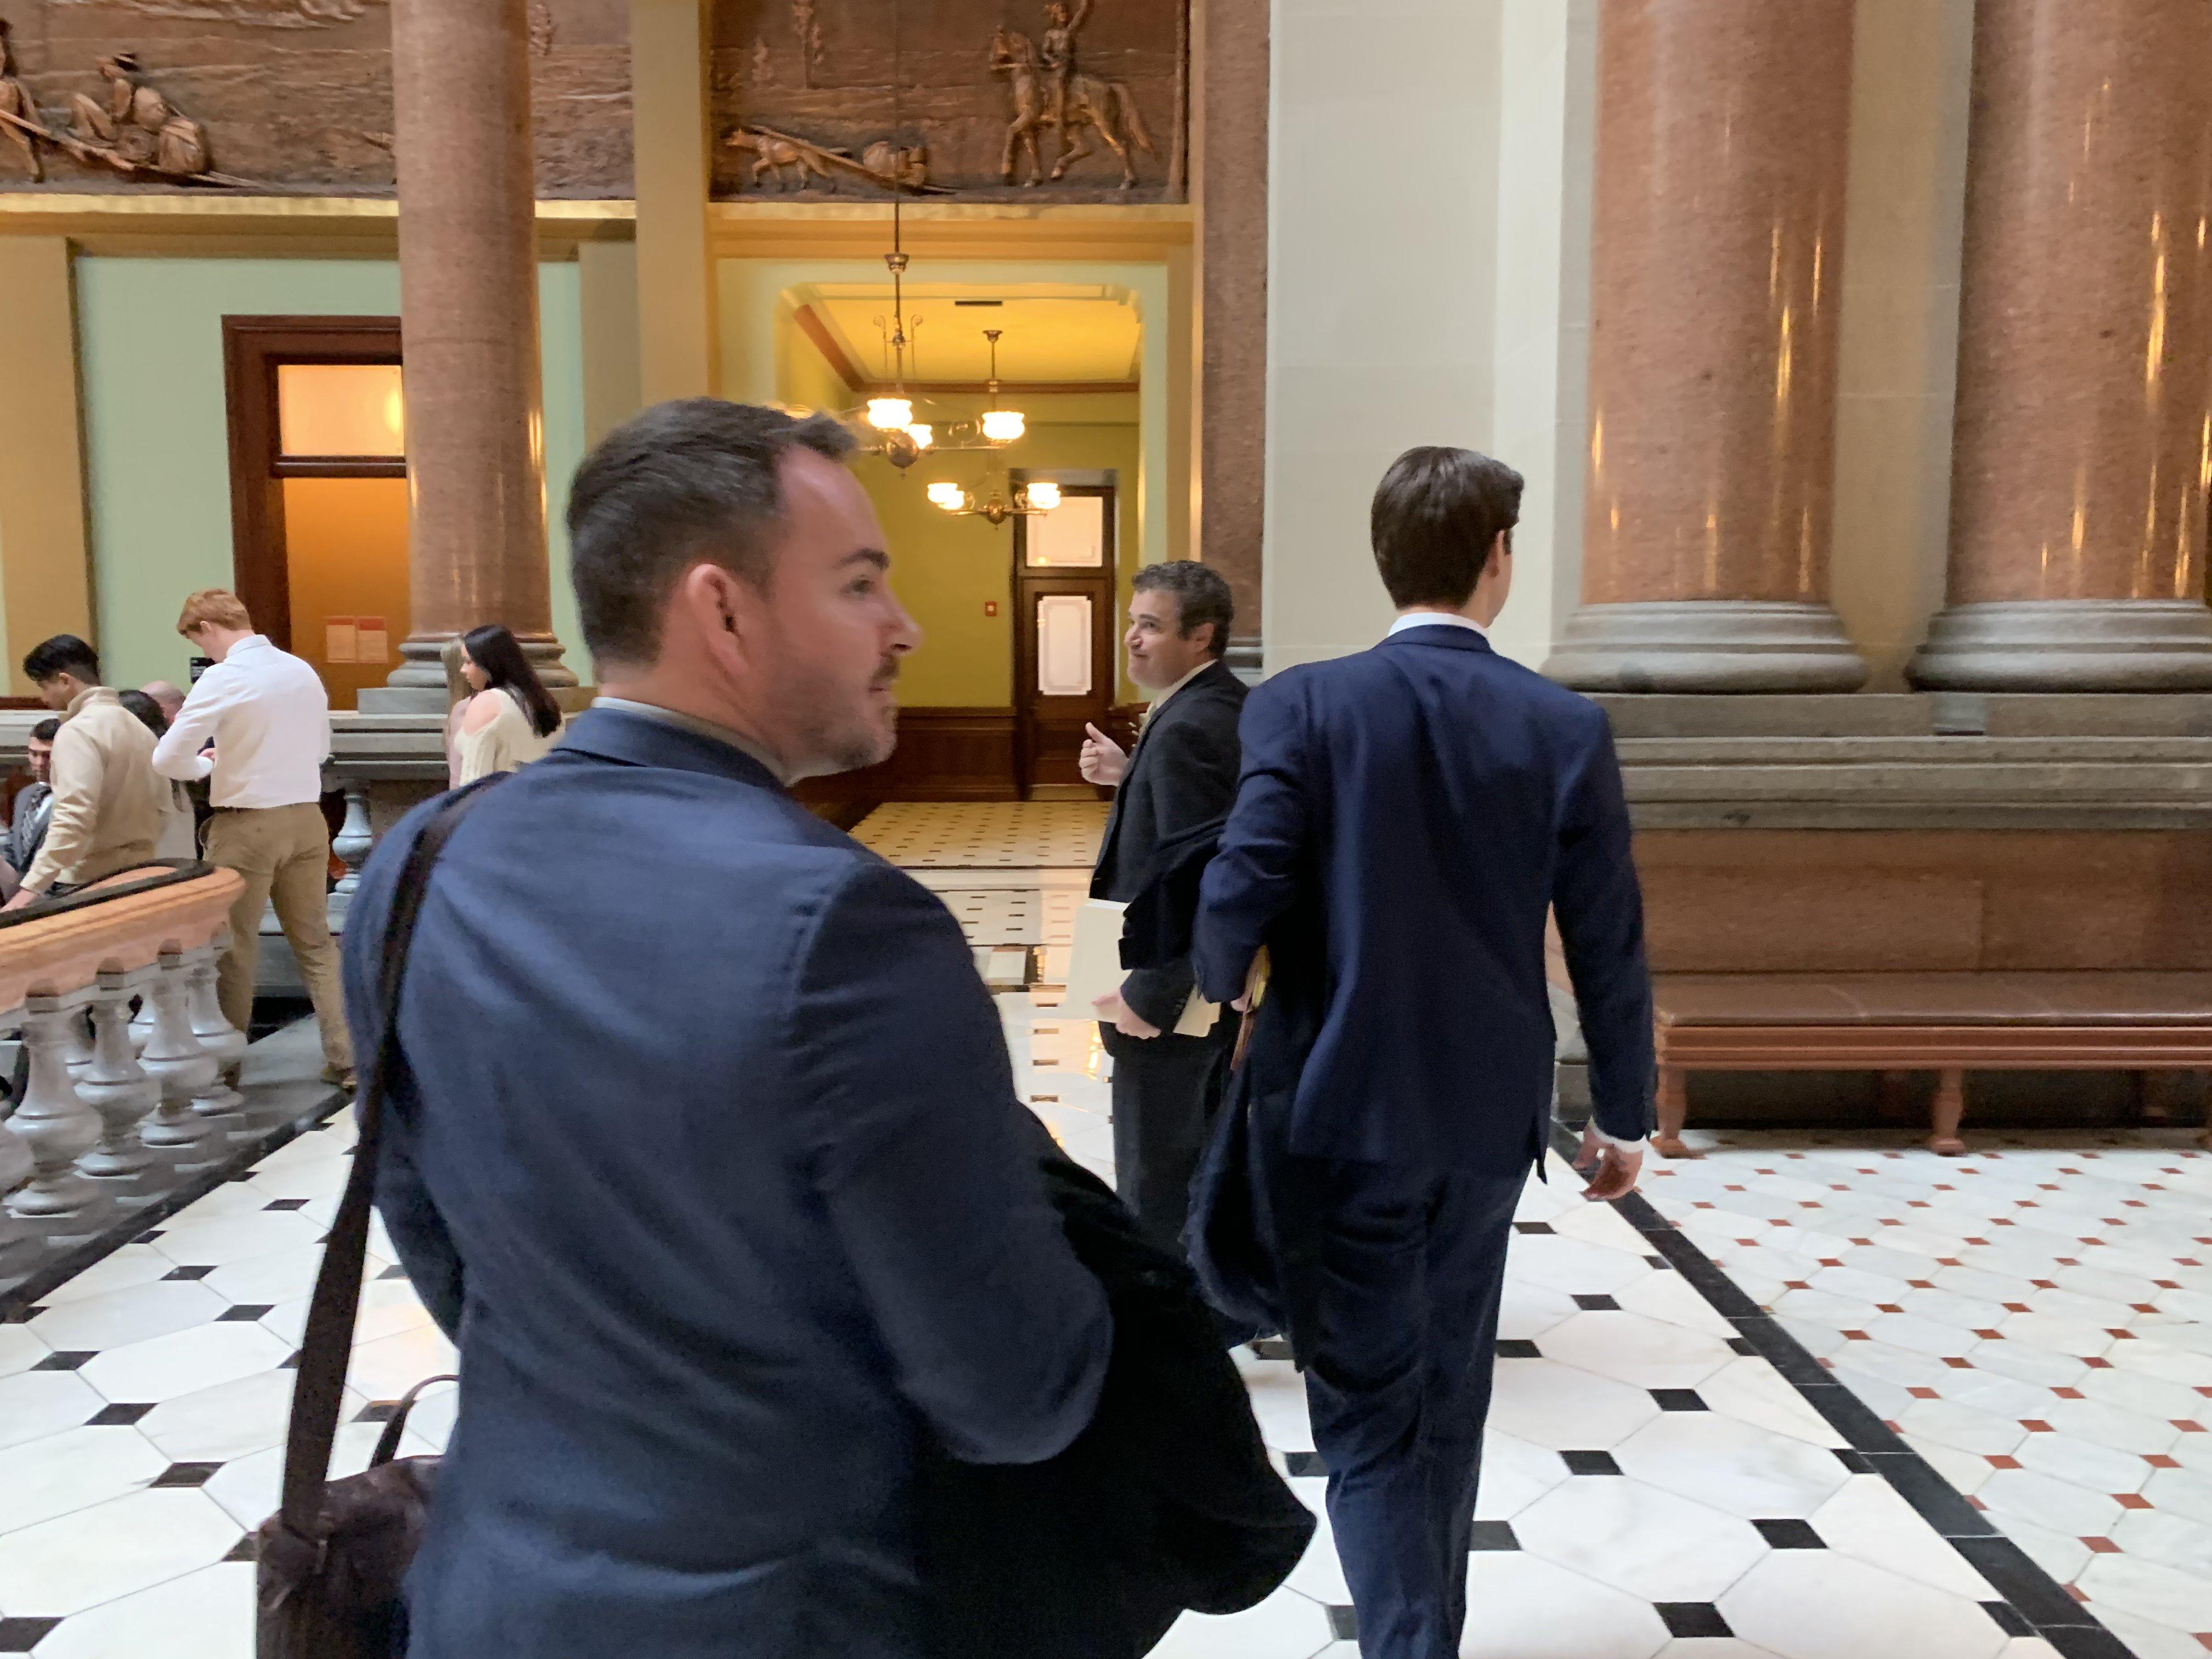 Salvi Lawyers inside the Courthouse